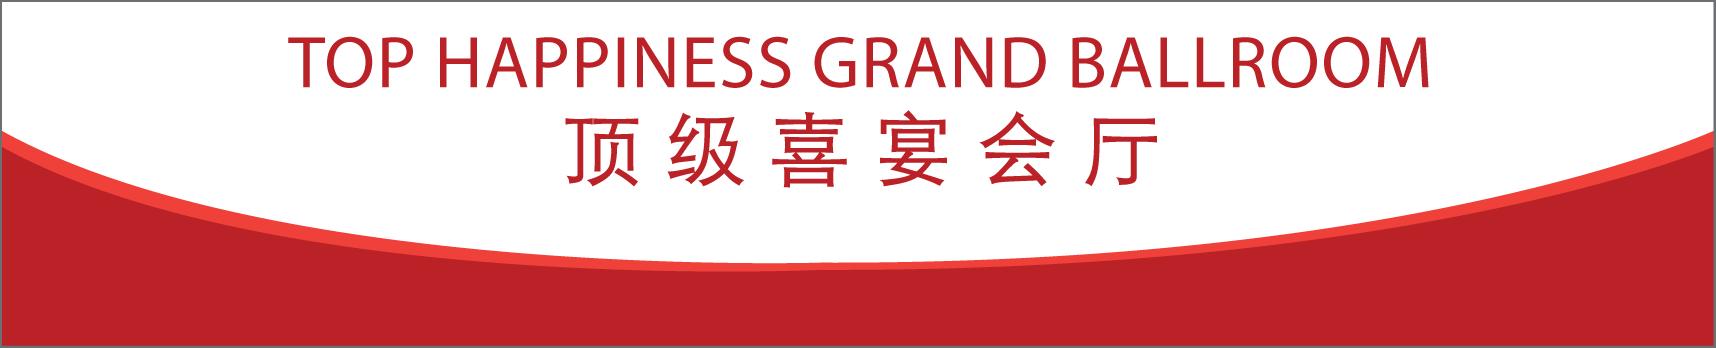 Top Happiness Grand Ballroom